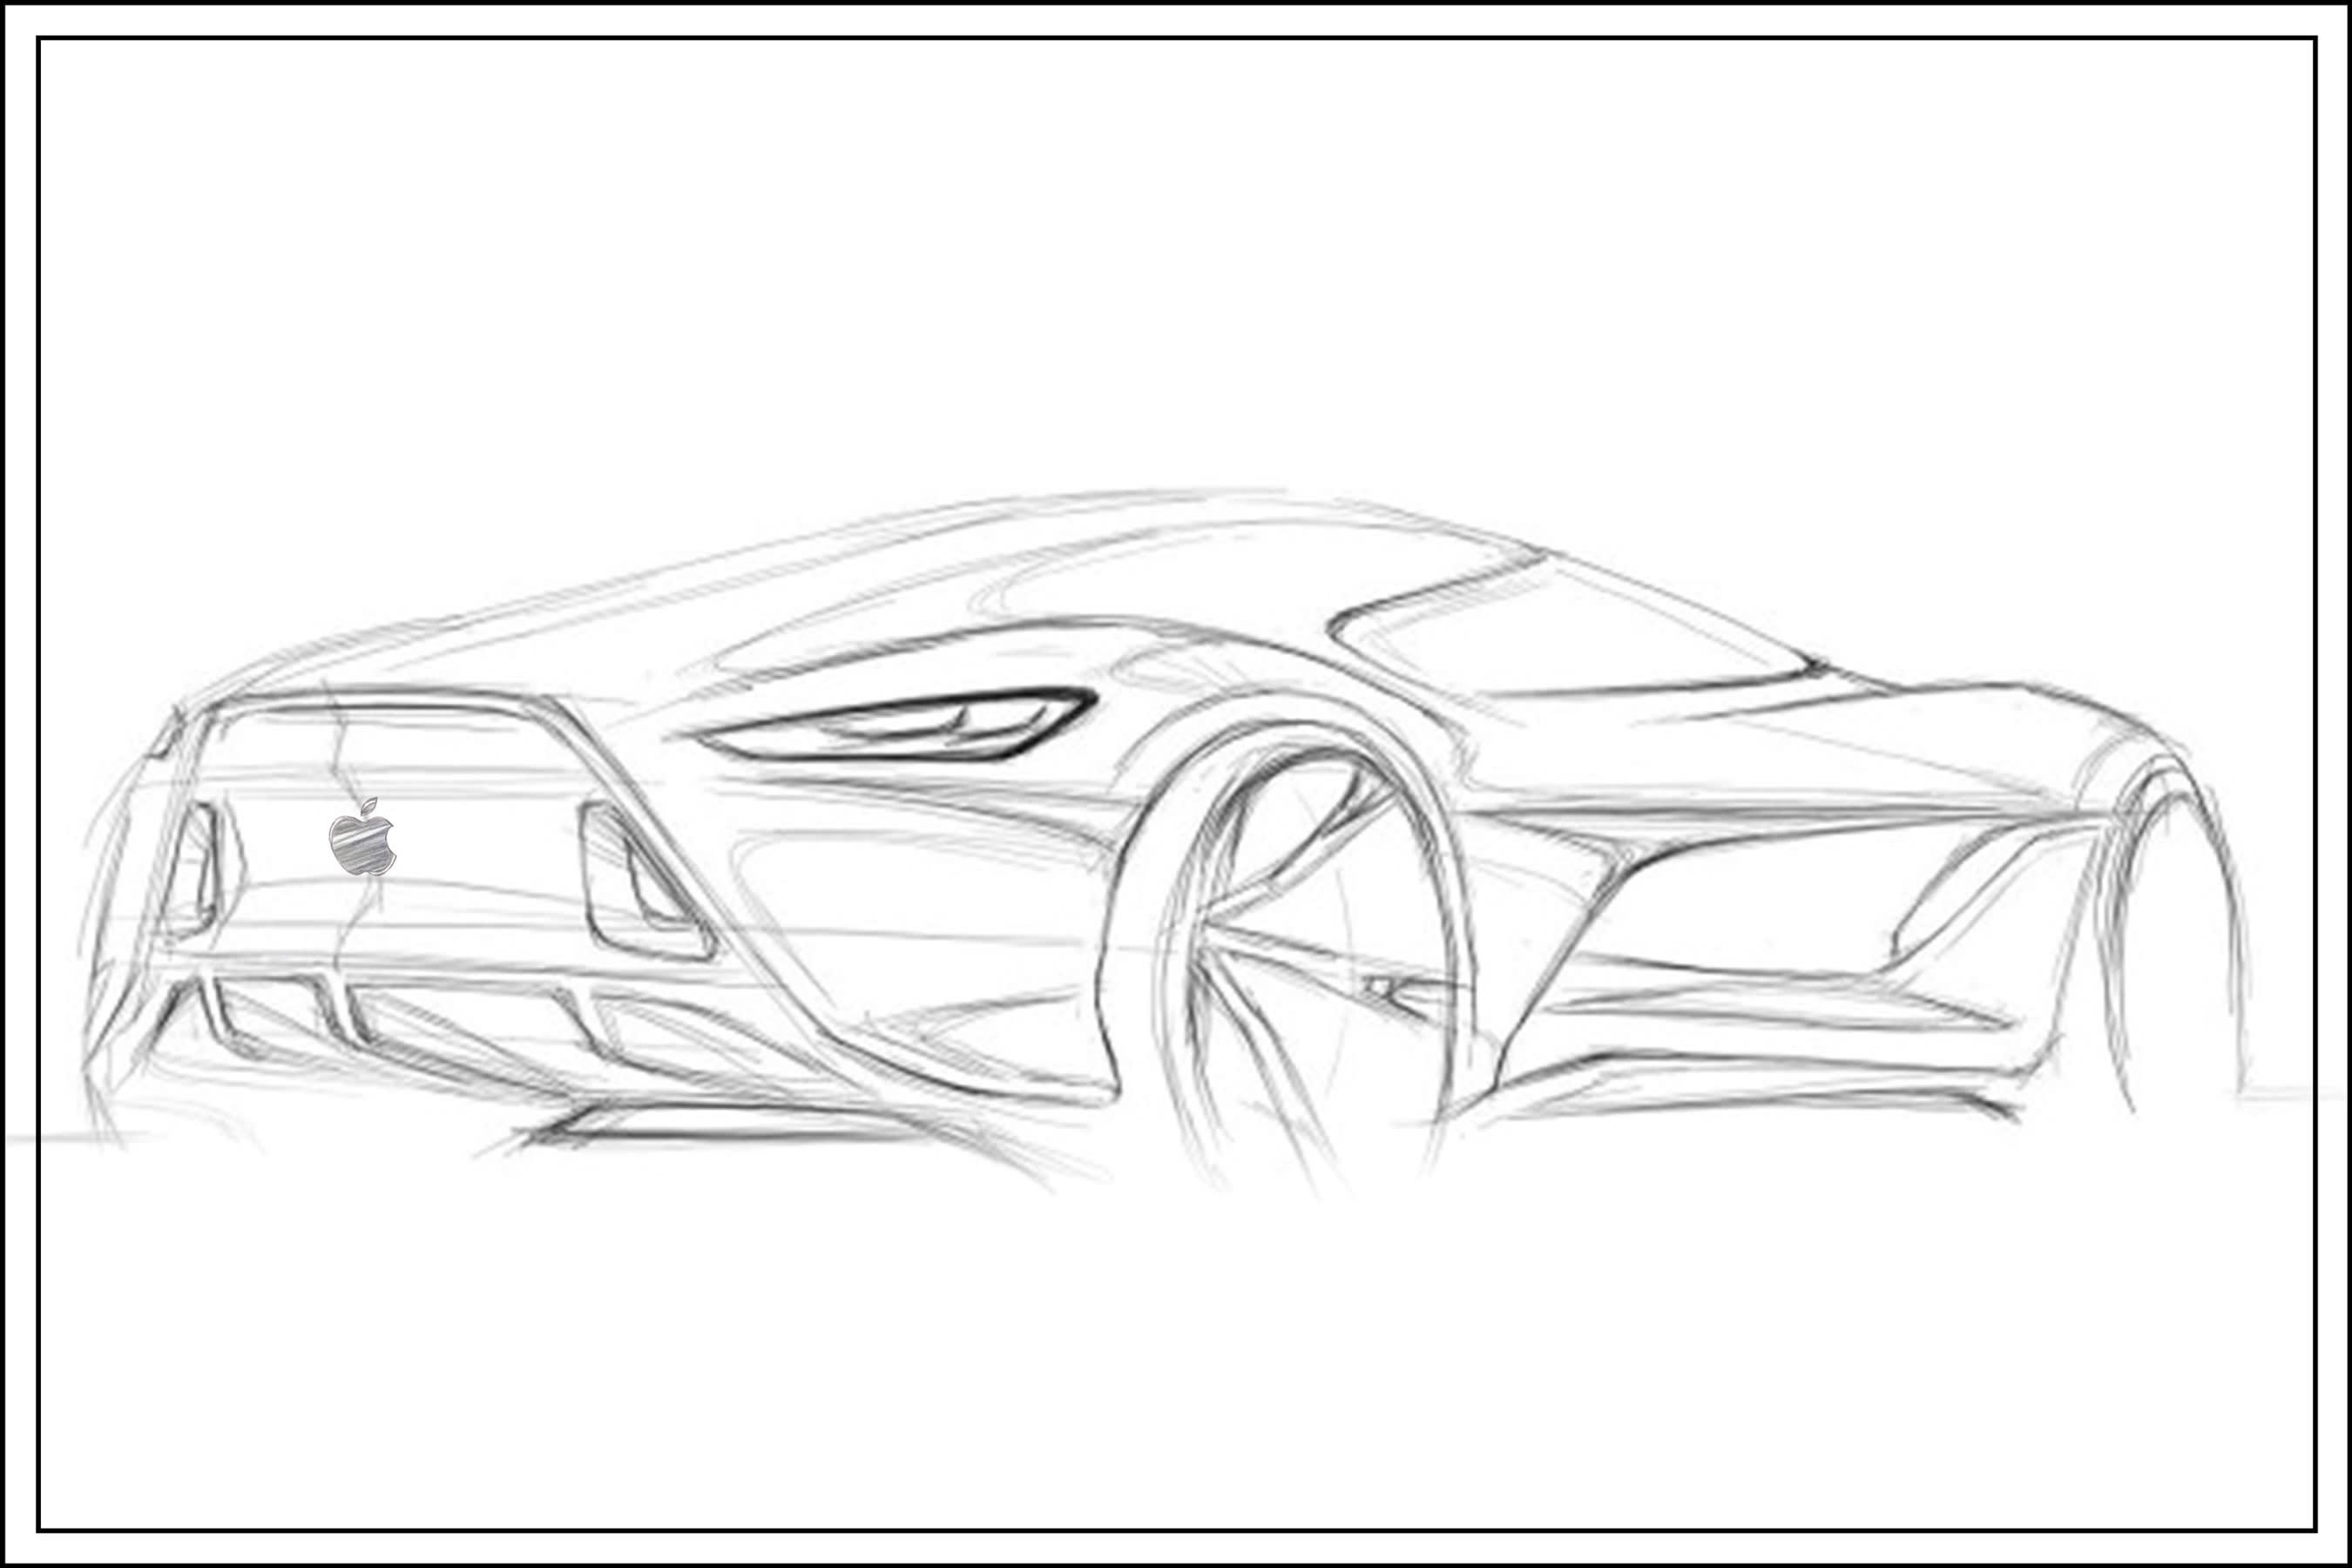 rechargeable-apple-car-design-sketech